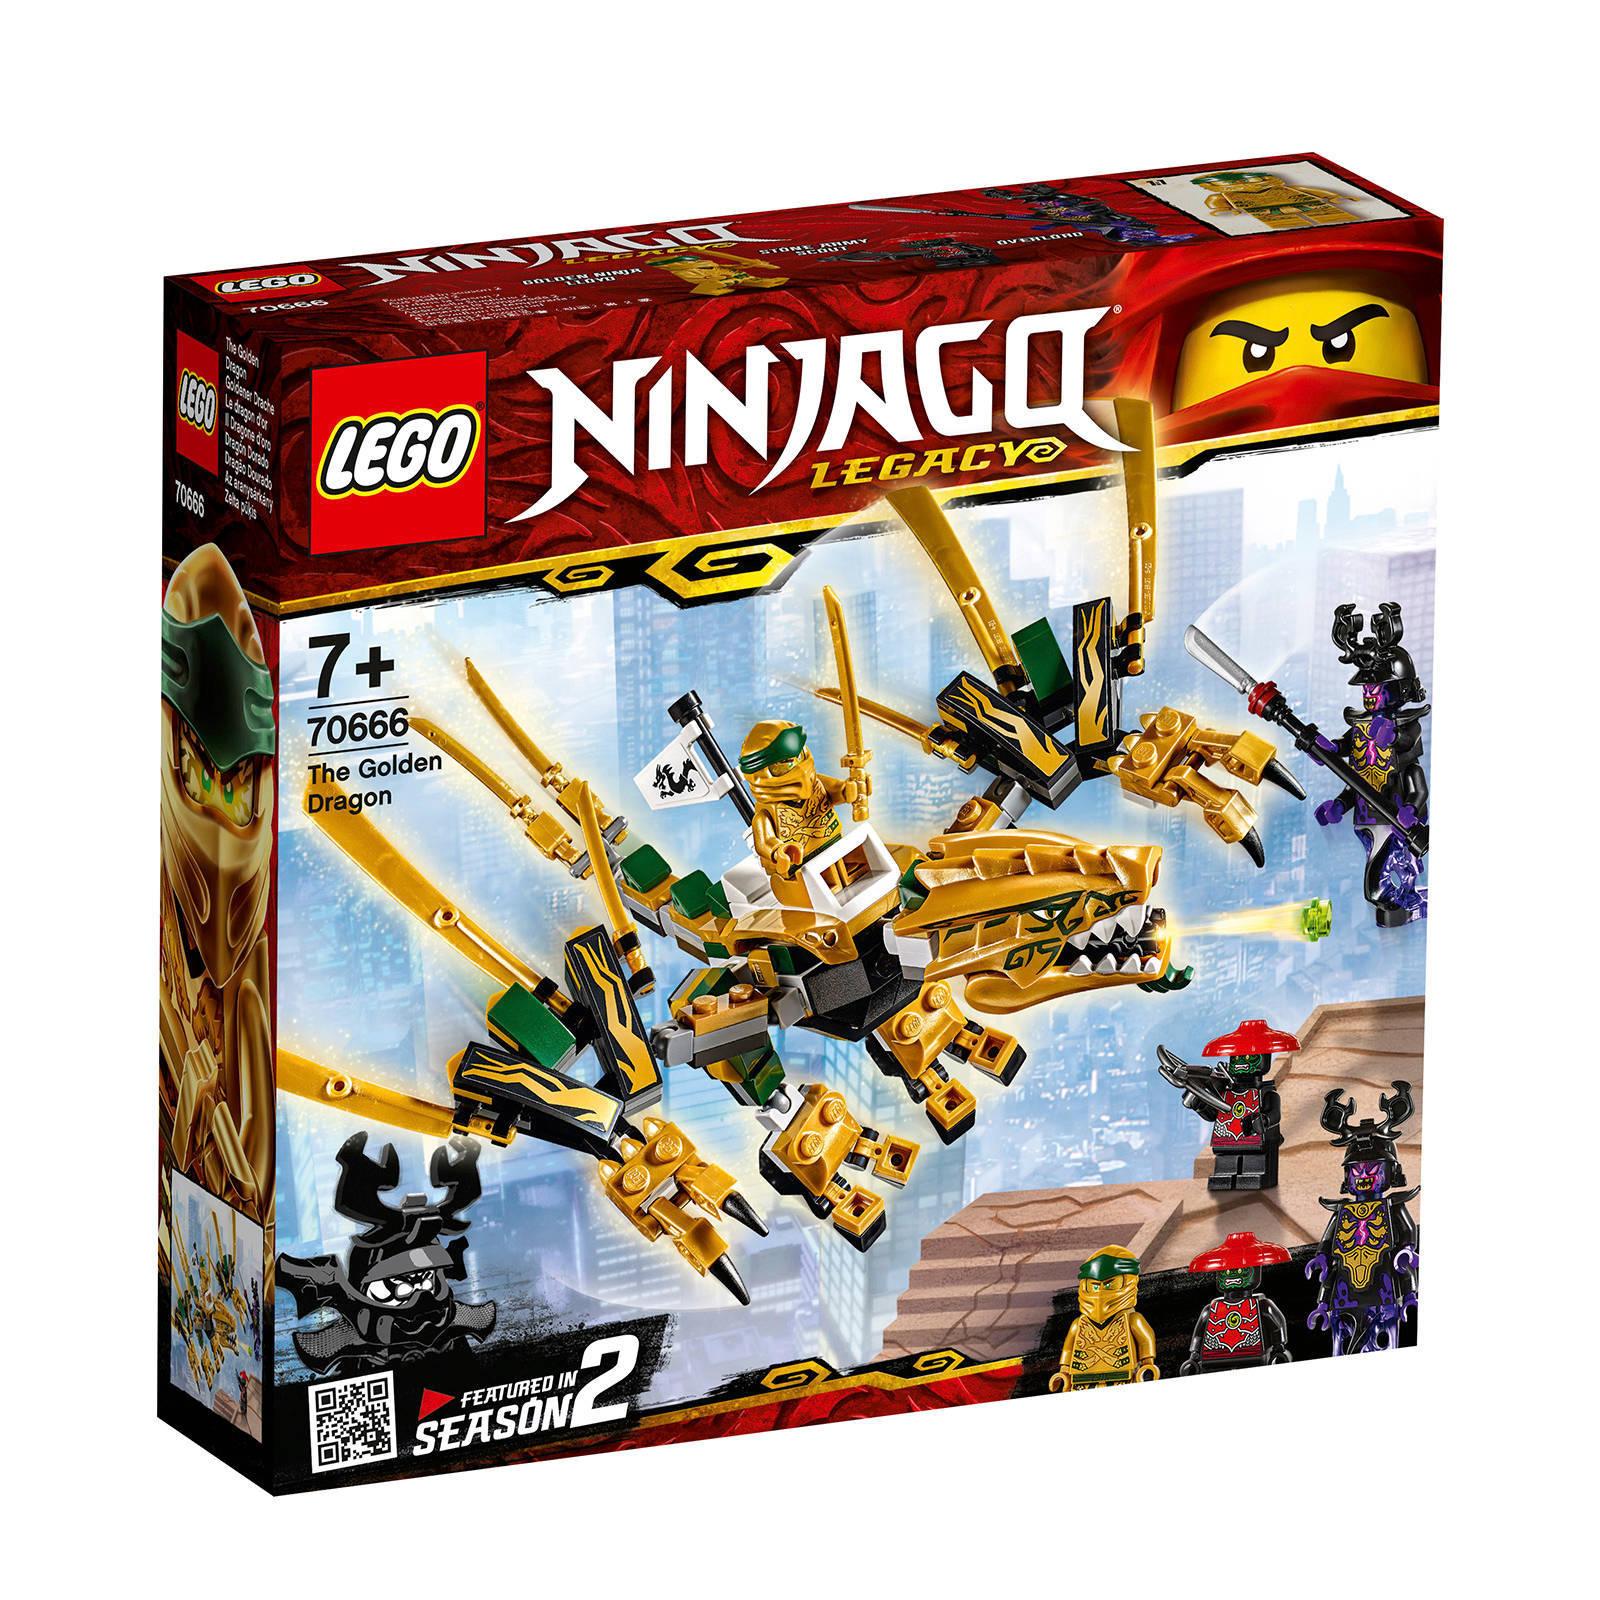 Lego Ninjago Bij Wehkamp Gratis Bezorging Vanaf 20